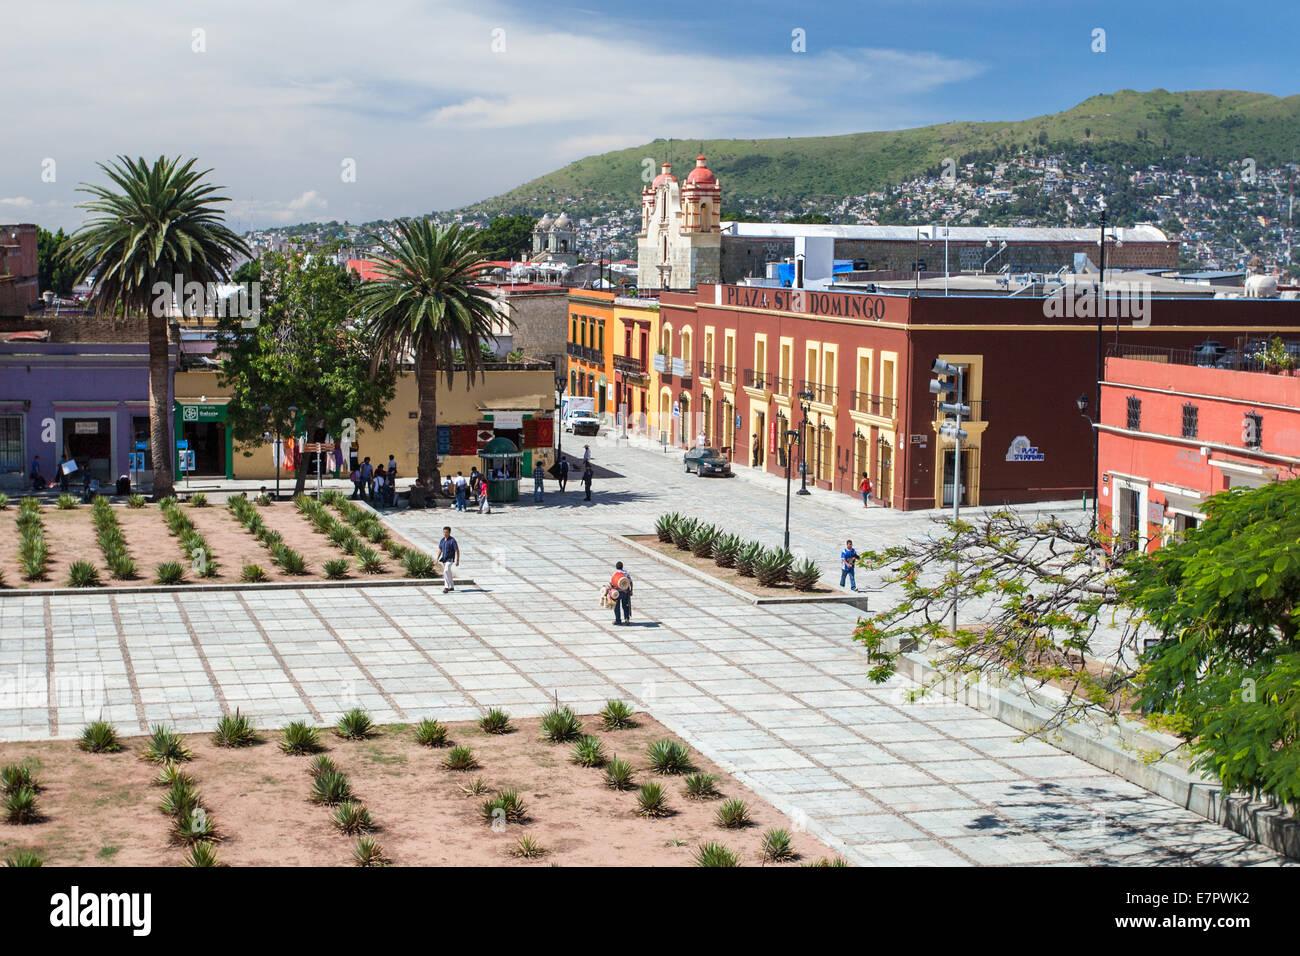 Santo Domingo Plaza in the historic downtown area of Oaxaca, Mexico. - Stock Image